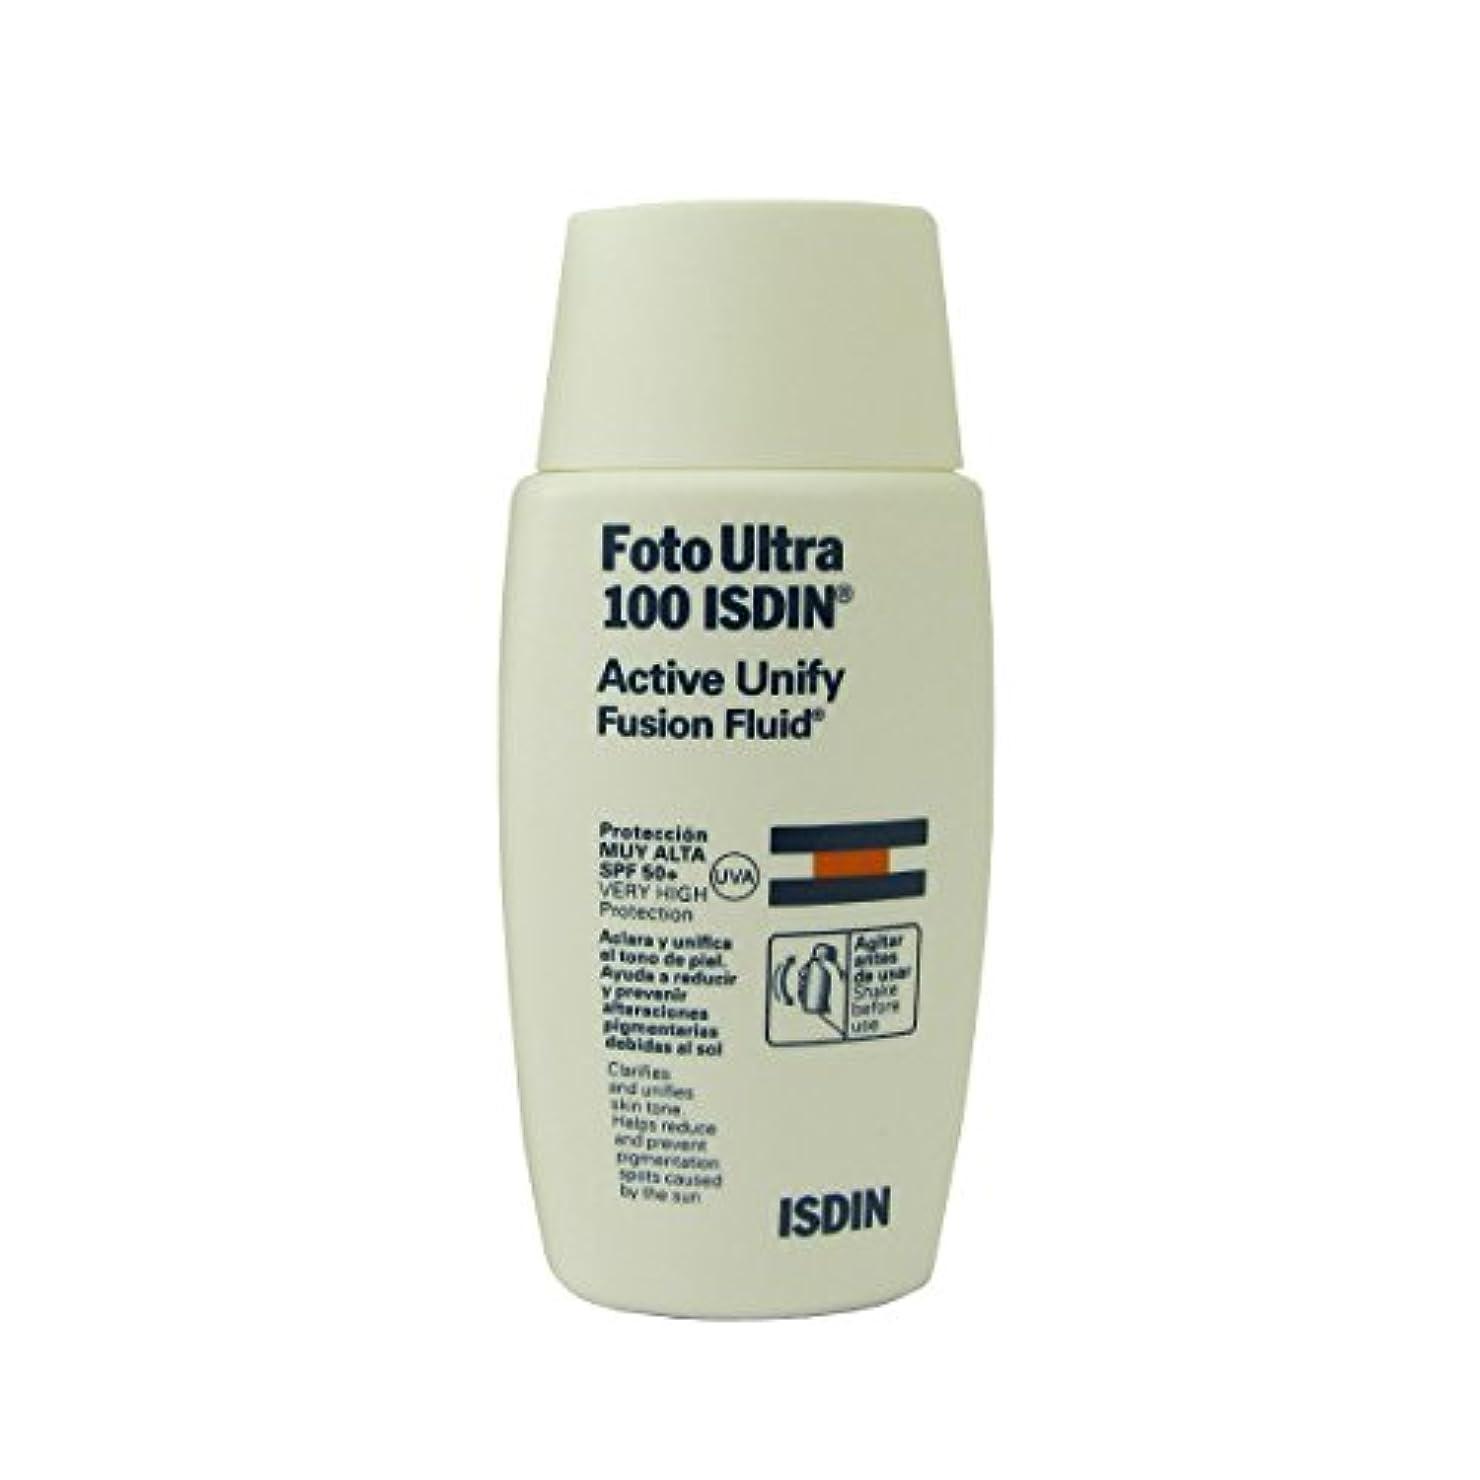 Isdin Foto Ultra 100 Active Unify Fusion Fluid 50ml [並行輸入品]